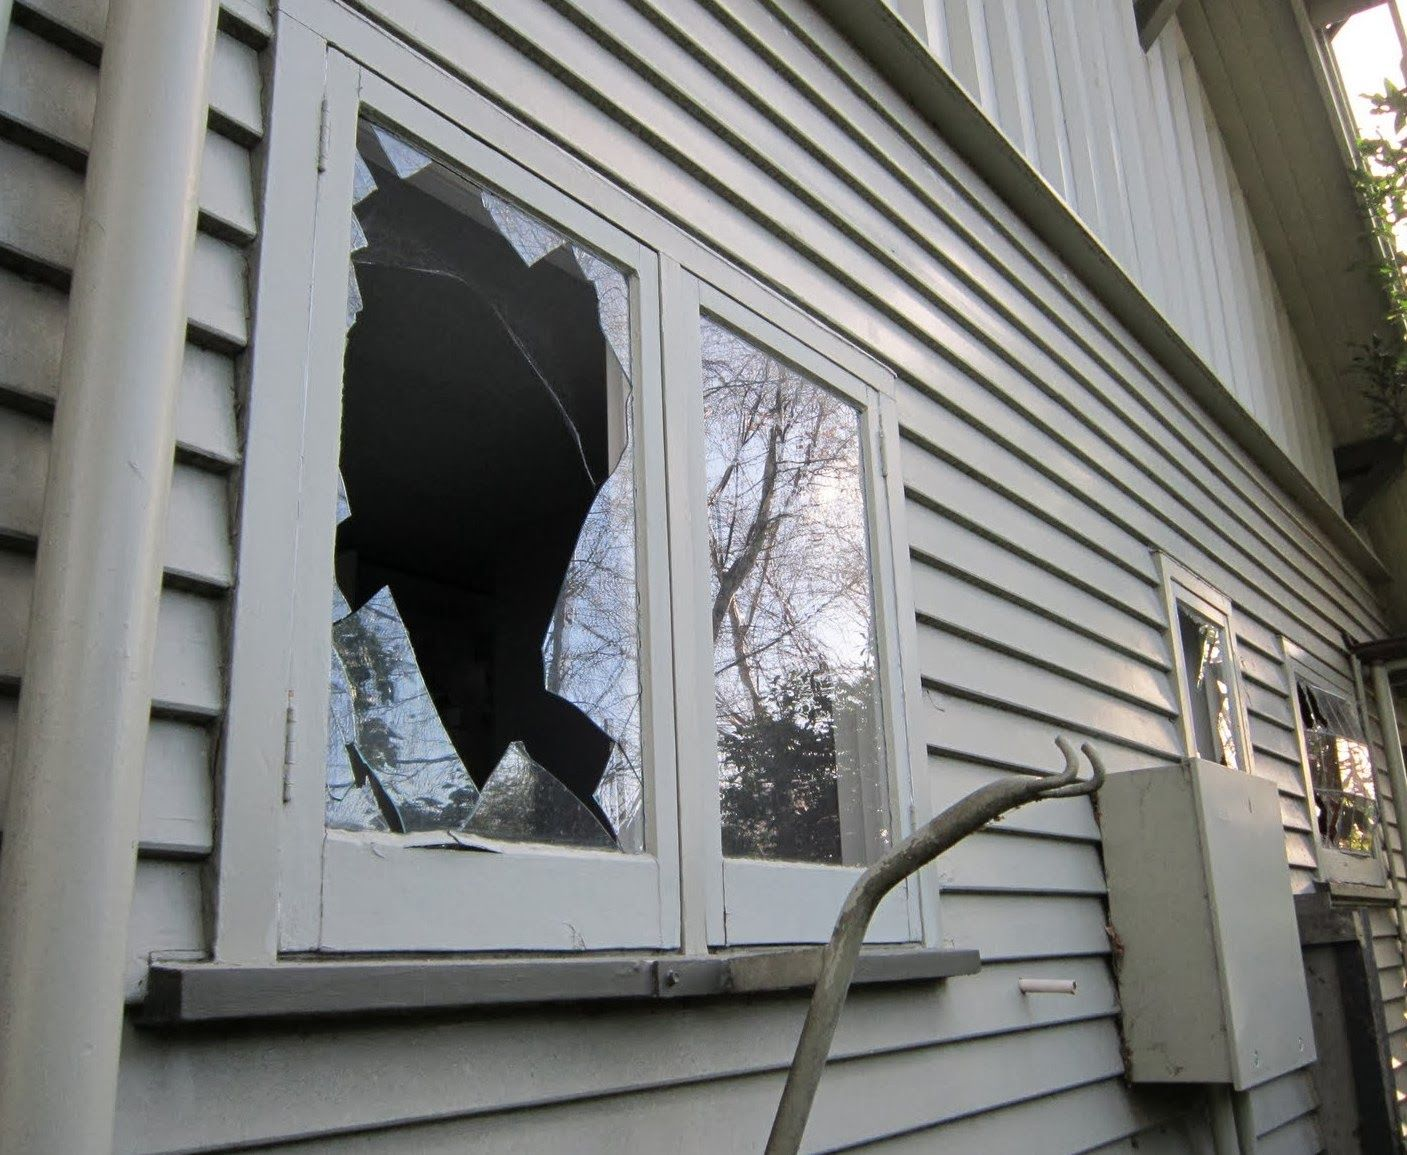 How To Repair Cracked Glass Windows Window Glass Repair Broken Window Glass Repair